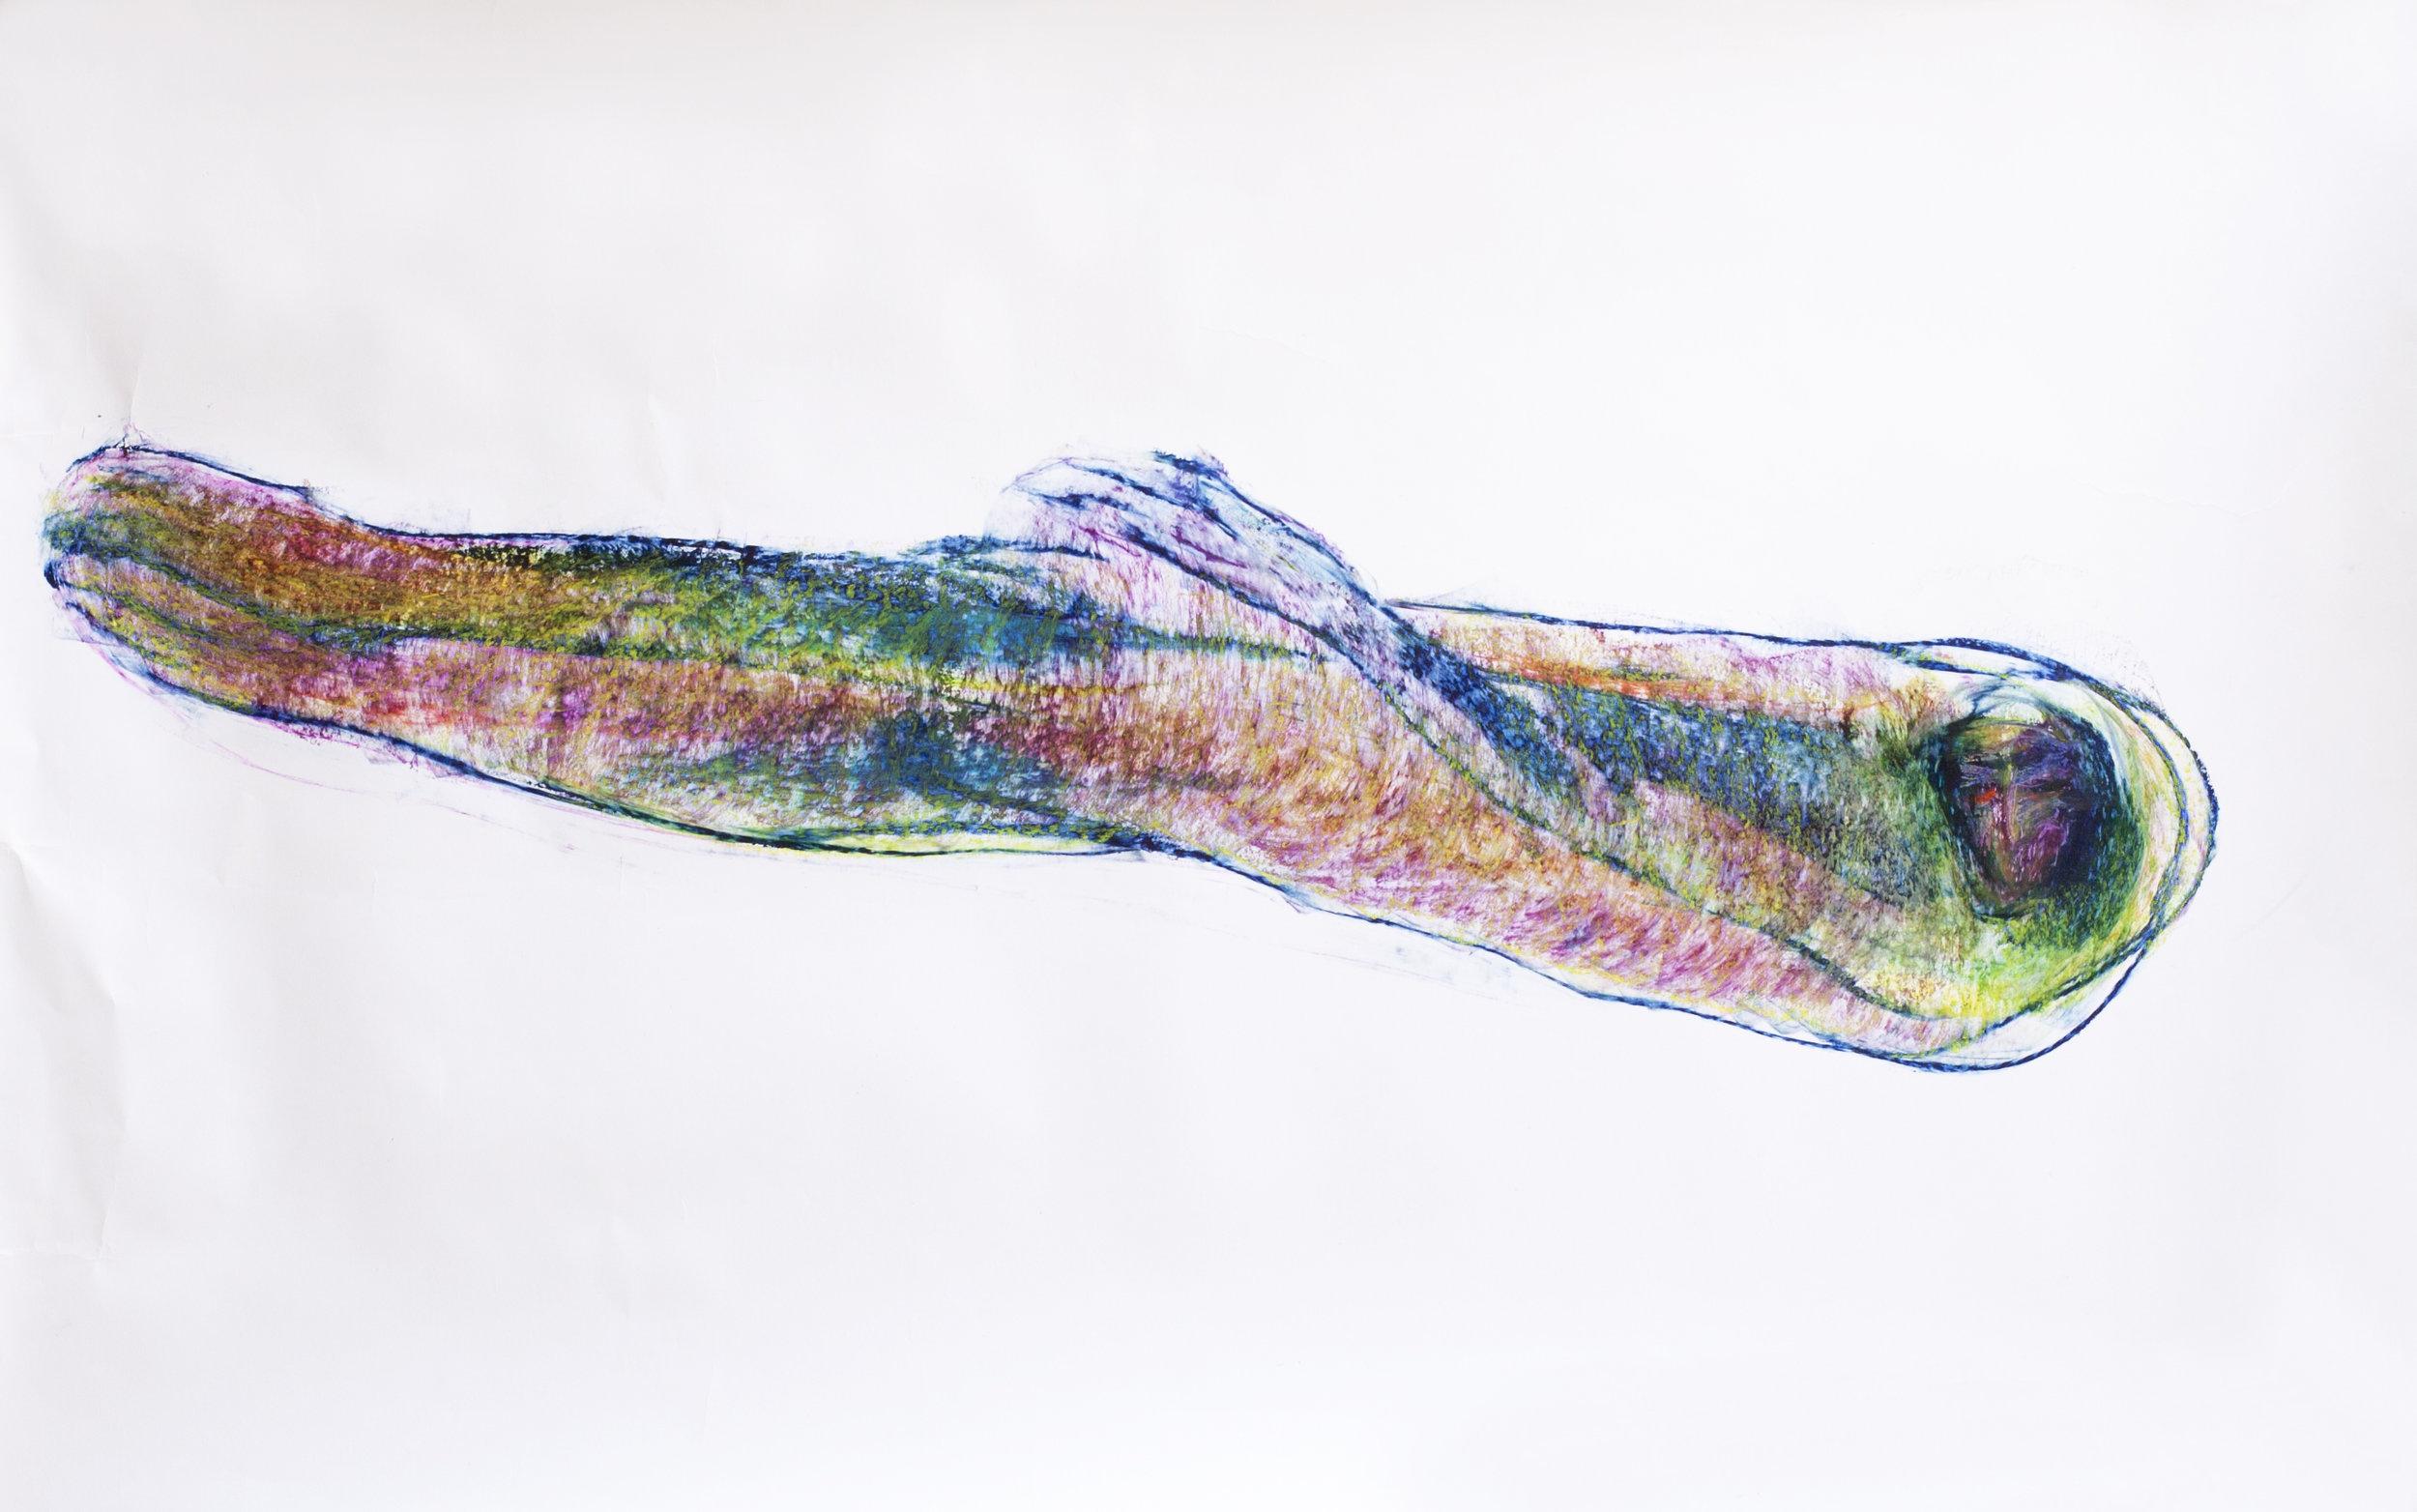 Oil Pastel on paper / 150 cm x 100 cm / 2016